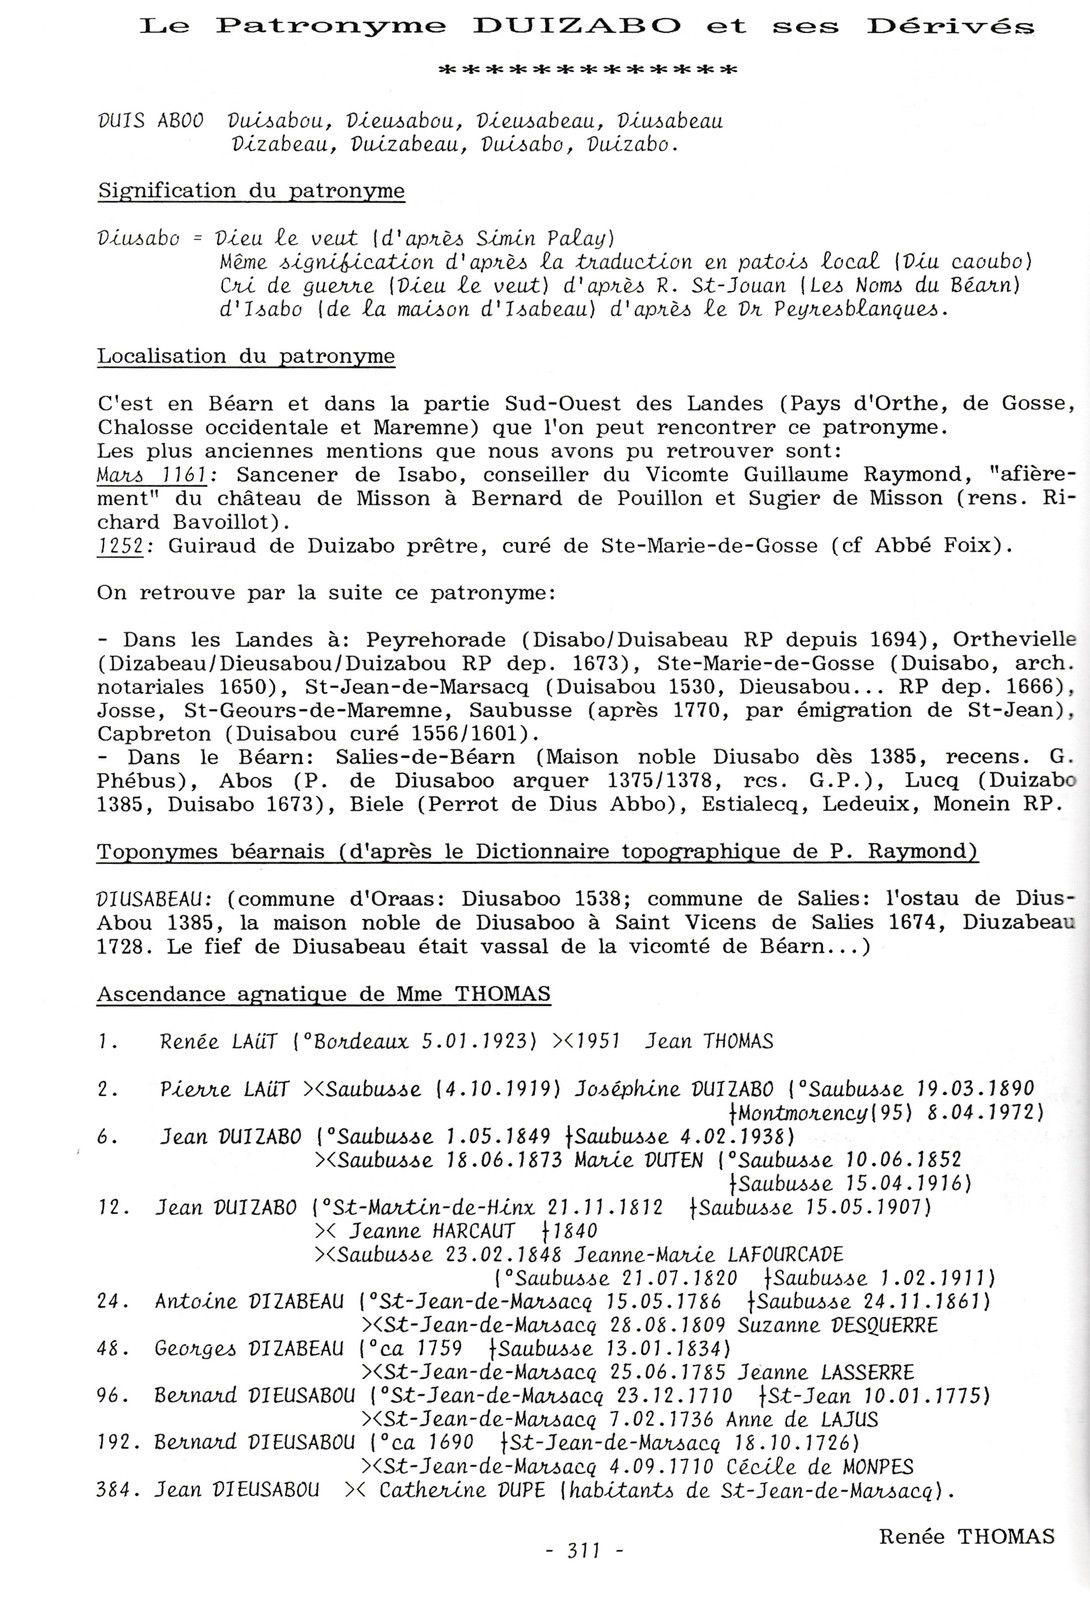 Reproduction du bulletin N°13 du CGL mars 1990